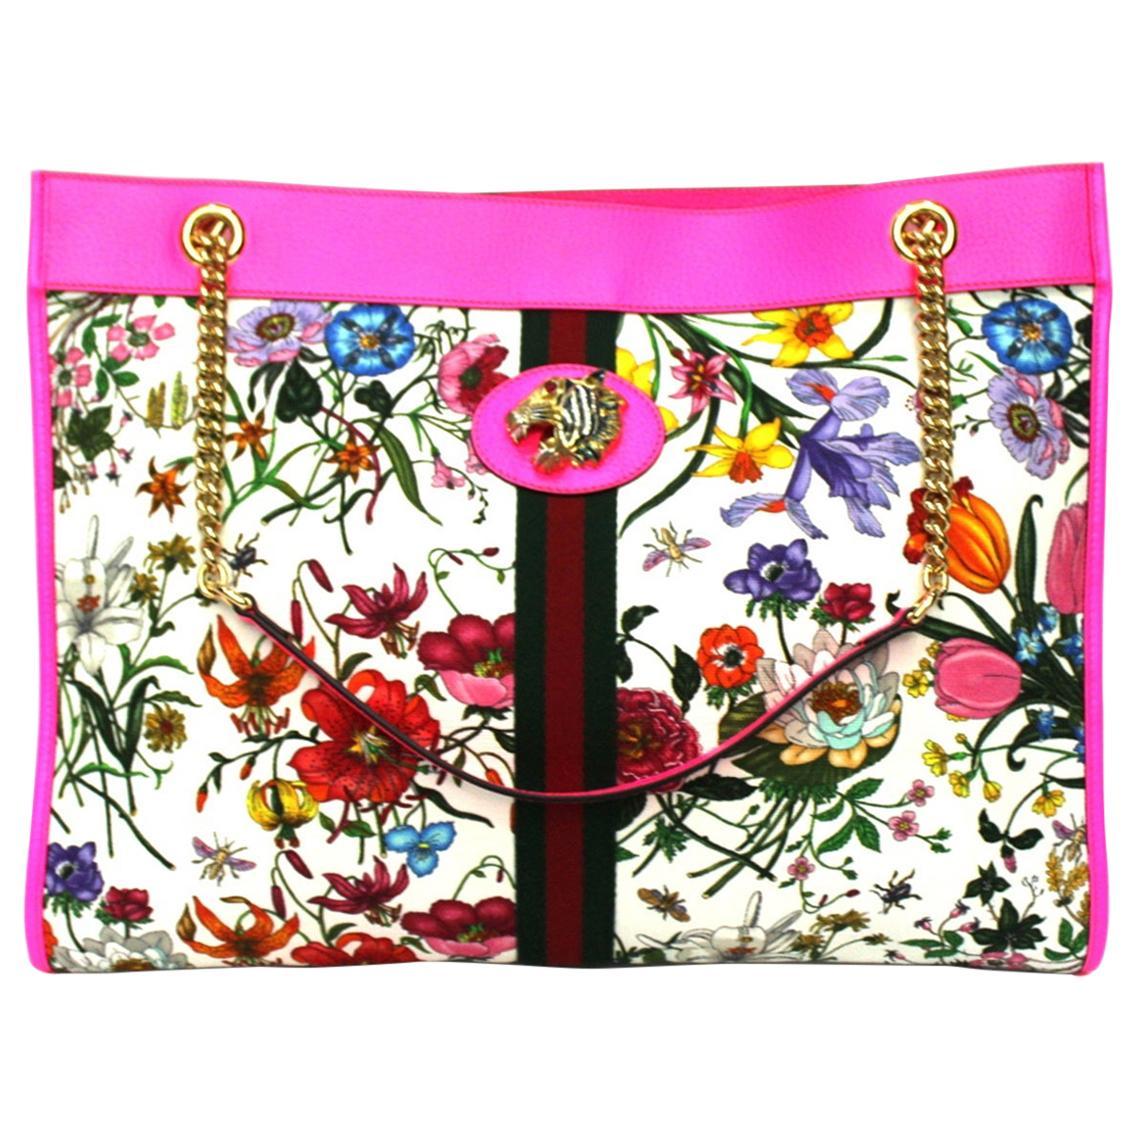 2020 Gucci Pink Leather Rajah Bag